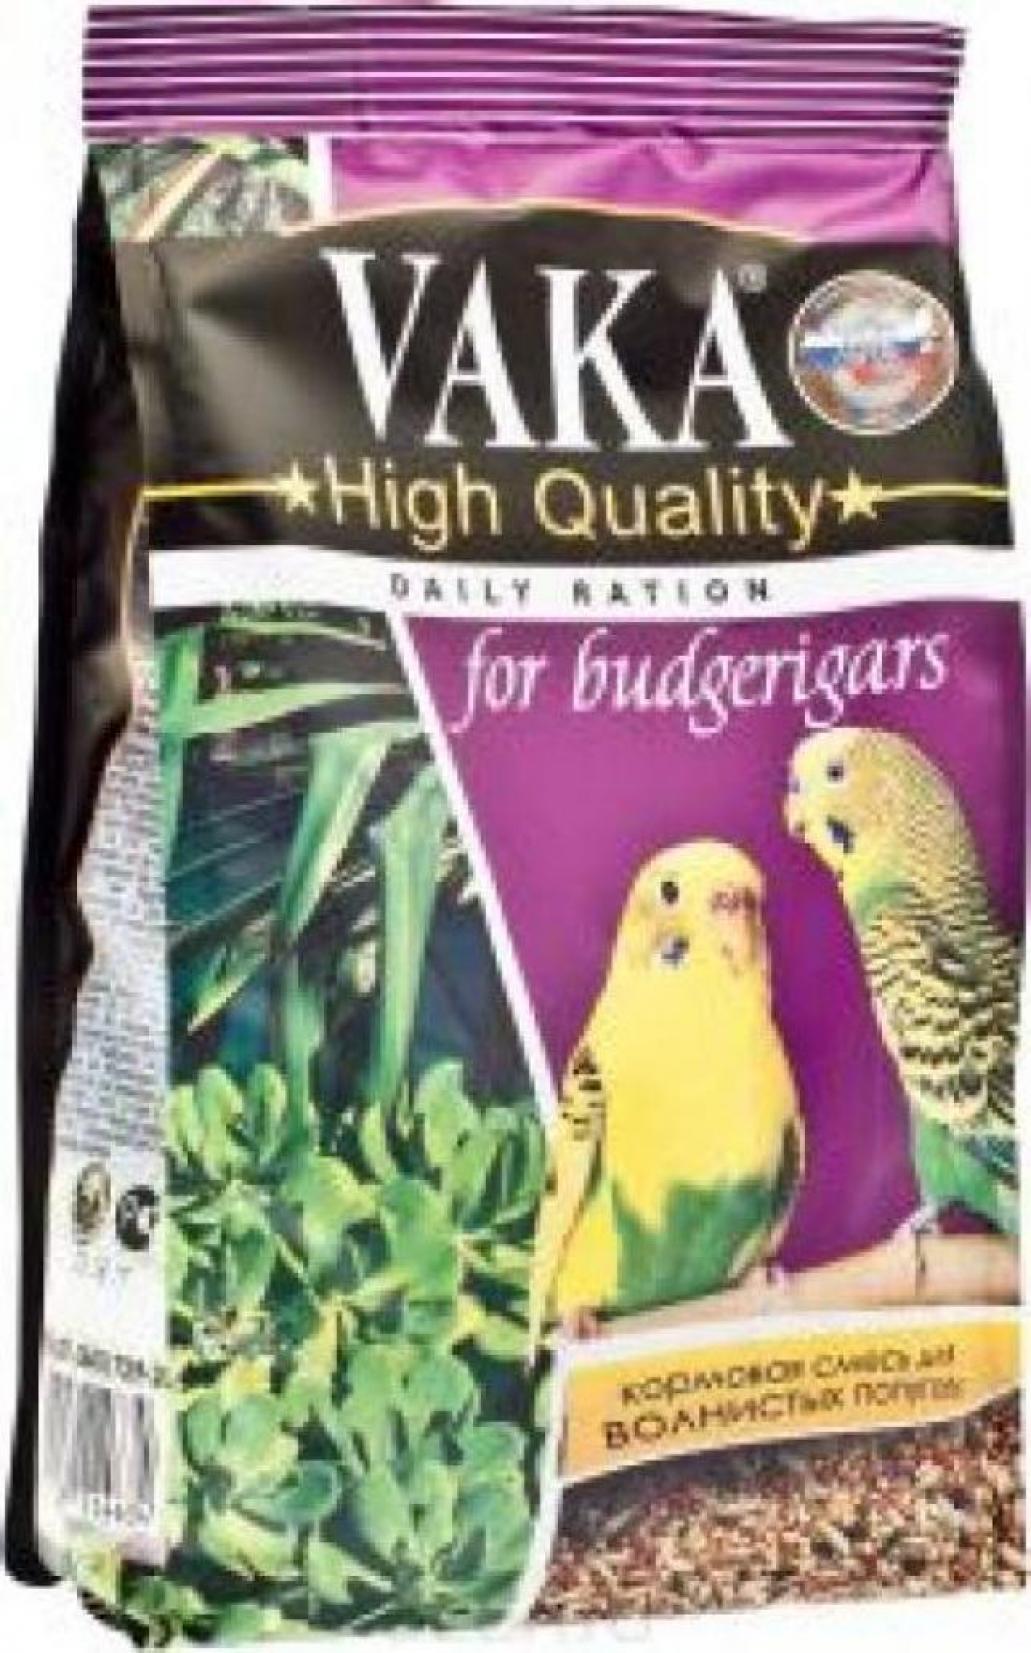 Вака High Quality корм дволнистых попугаев 500 гр, 1000100471